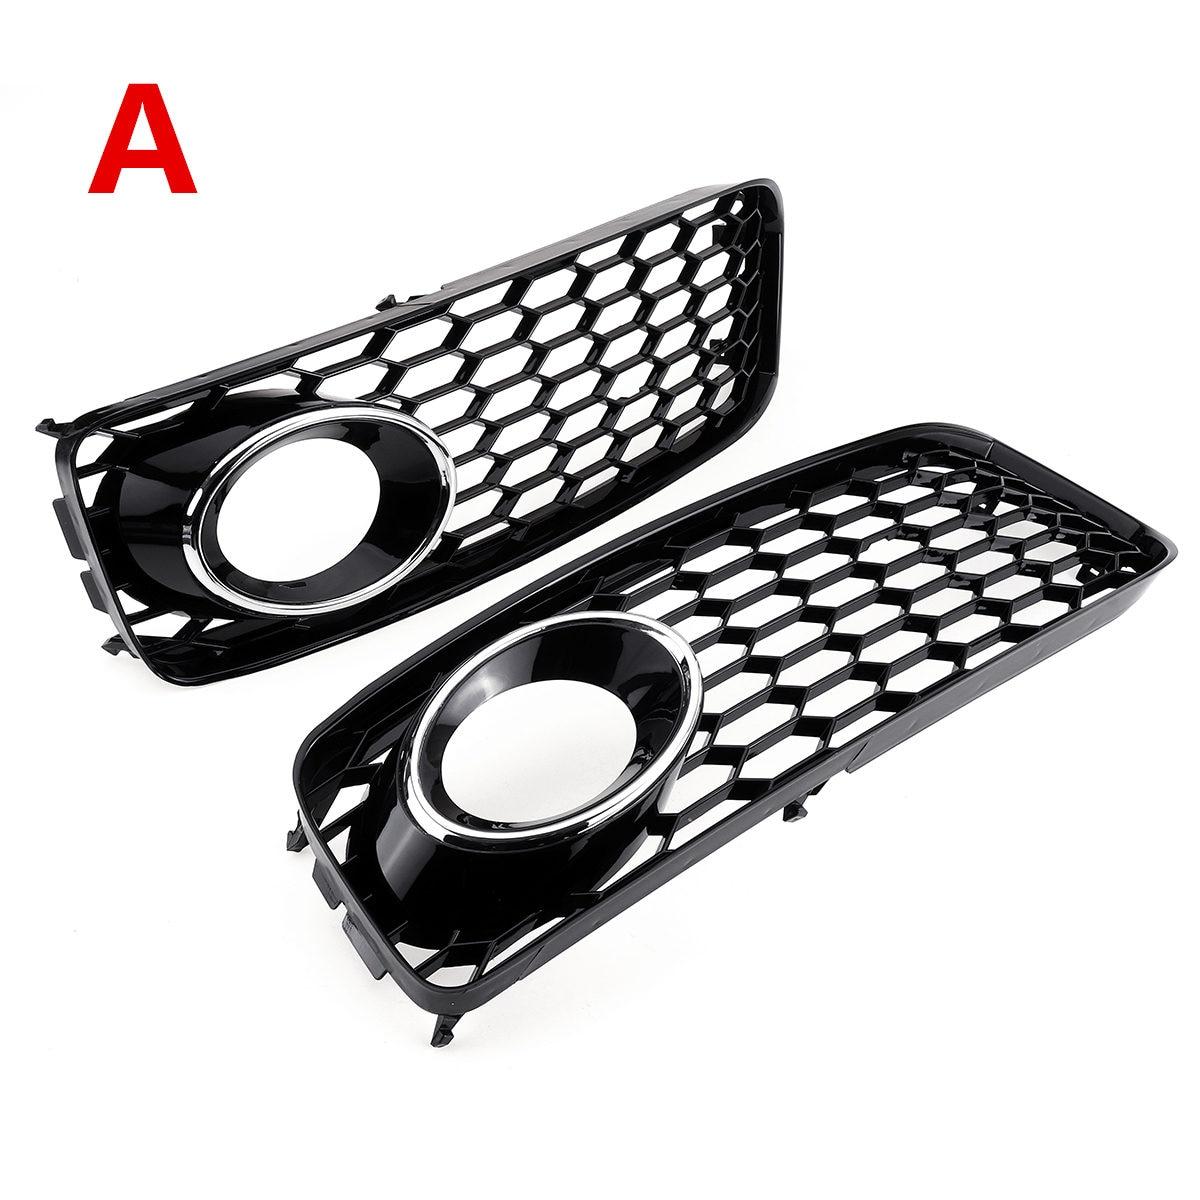 1 par de luces antiniebla negras/cromadas plateadas para coche cubierta de malla de nido de abeja rejilla hexagonal para Audi A5 s-line/S5 B8 RS5 2008-2012